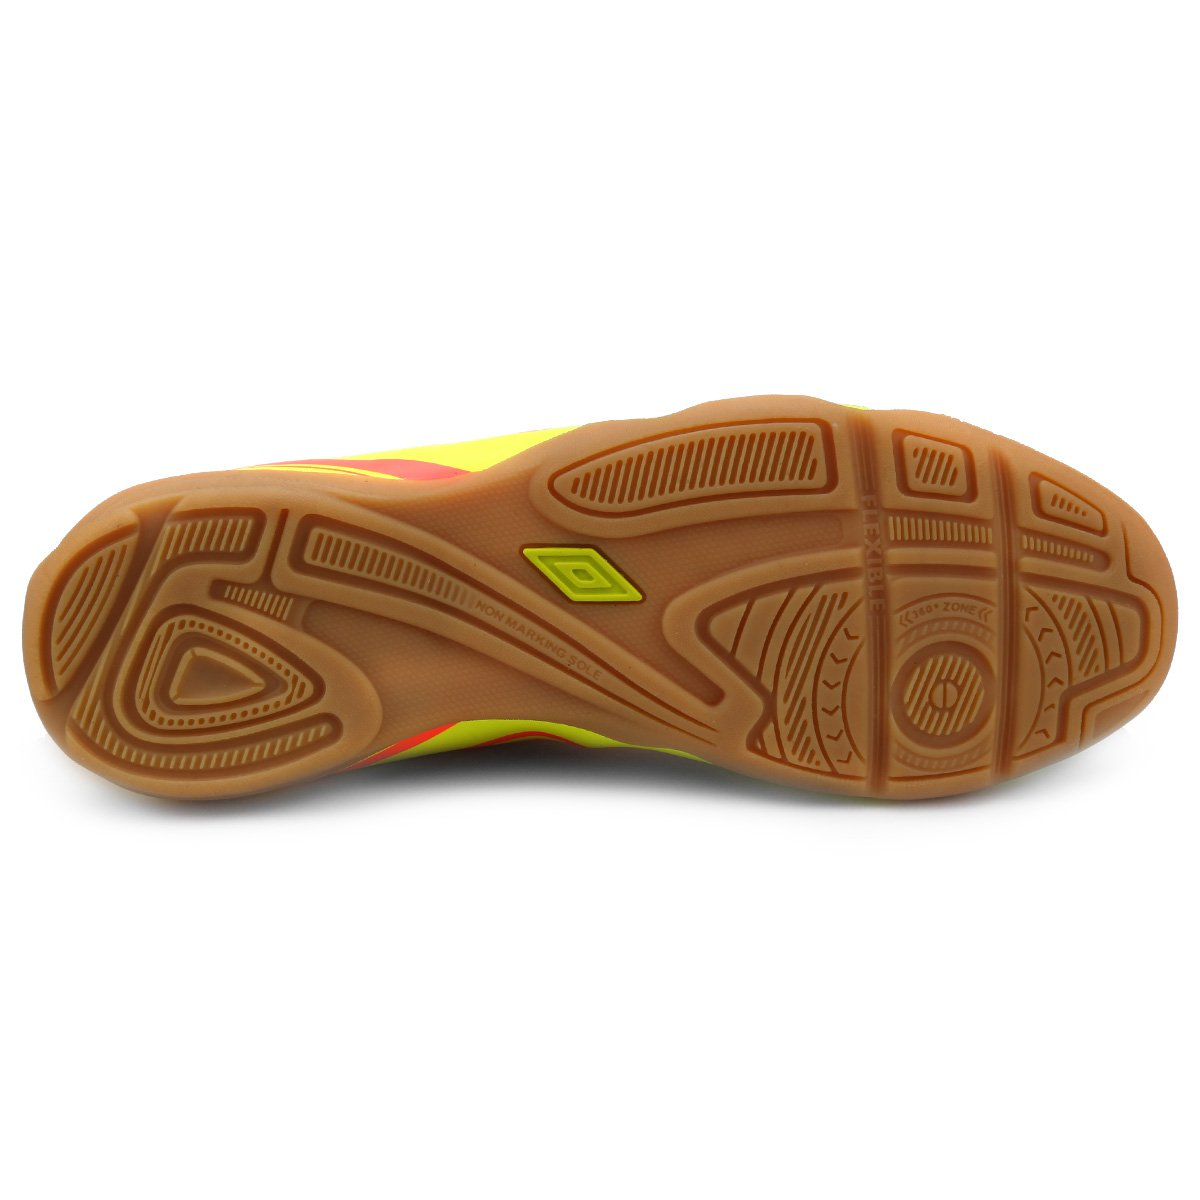 Amarelo Futsal Fluorescente e 3 Chuteira Striker Vermelho Masculina Umbro pXnwUPqd